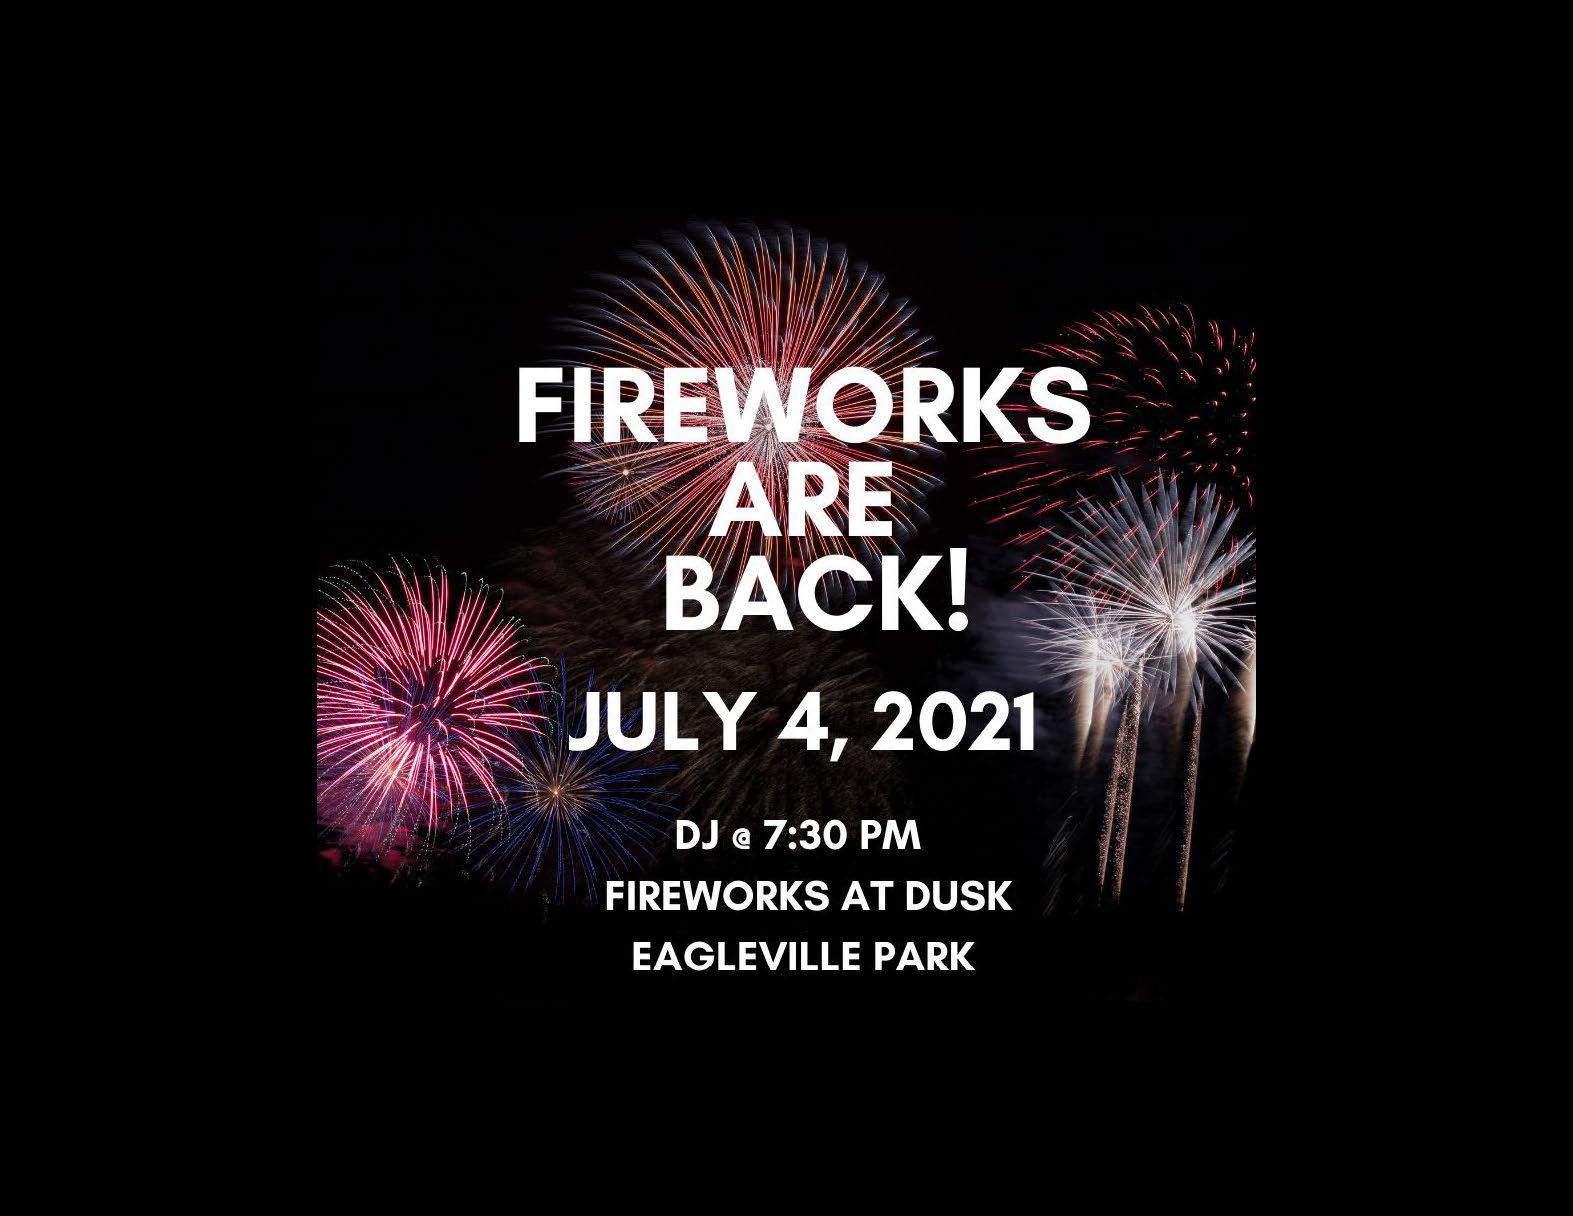 Fireworks Are Back! July 4, 2021